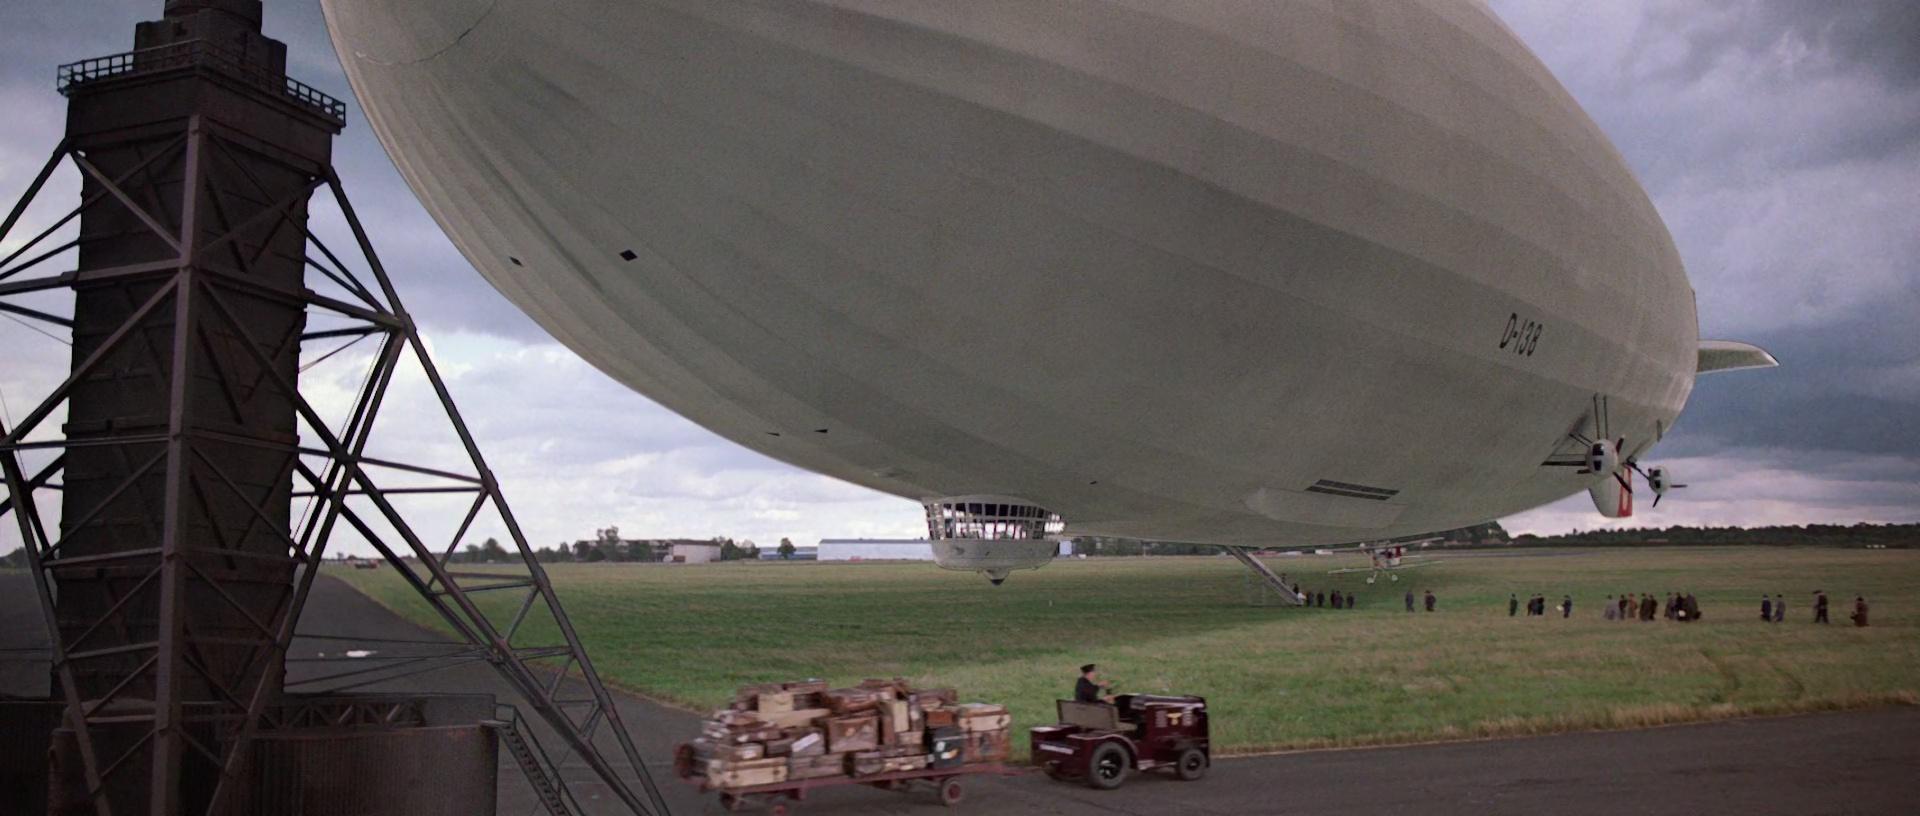 Image result for Last crusade zeppelin